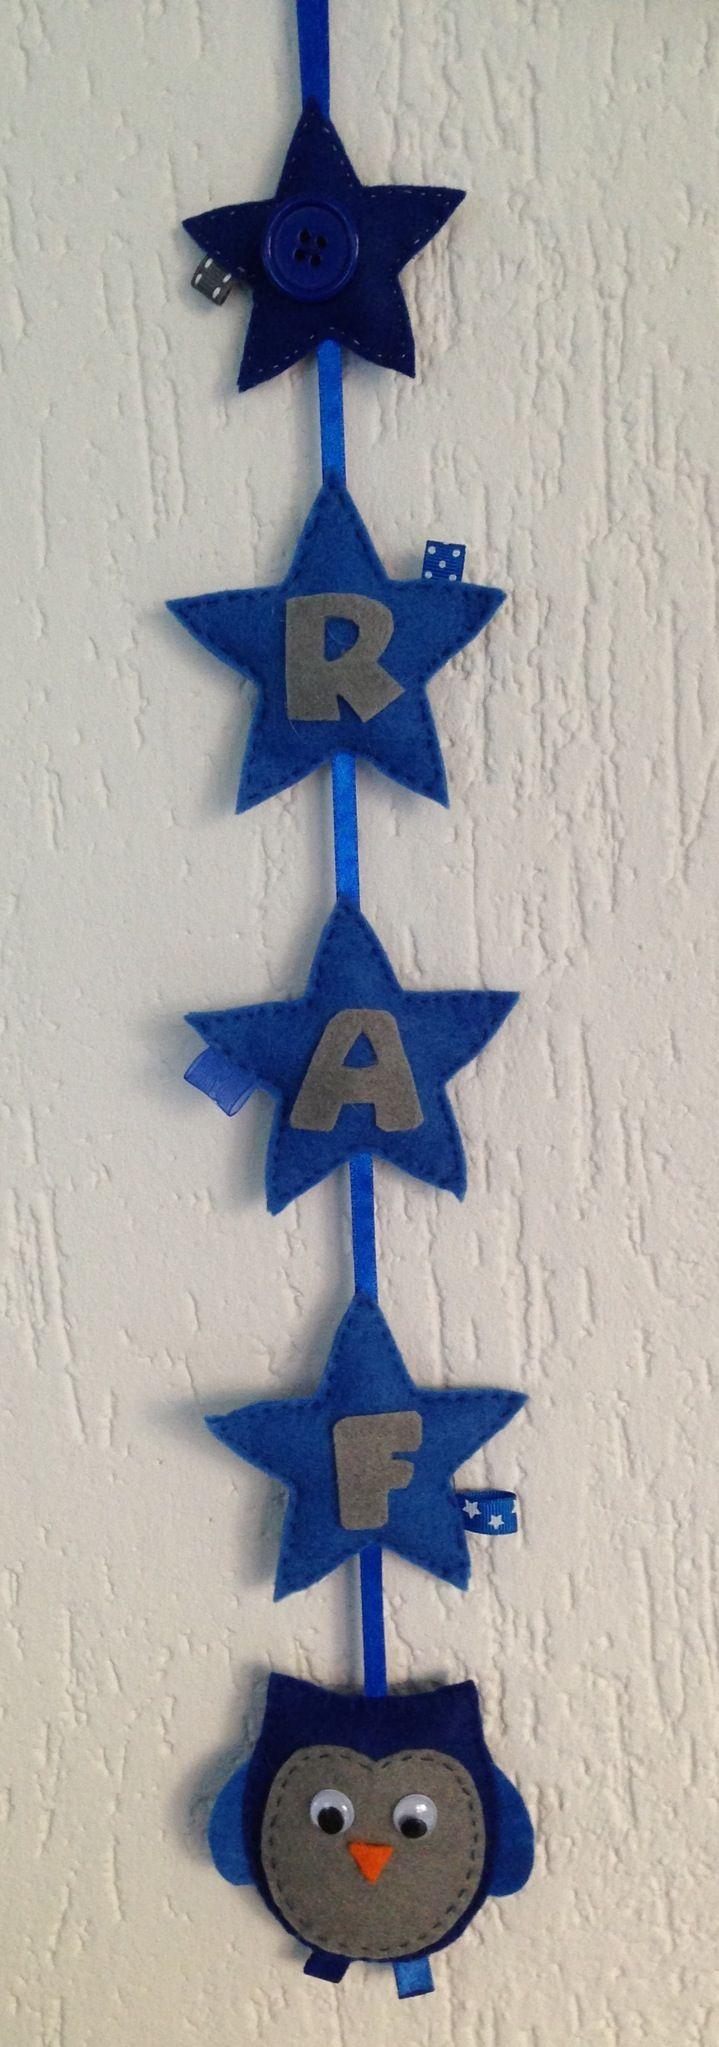 Naamslinger Raf, елочные игрушки из войлока, christmas crafts, ideas for…